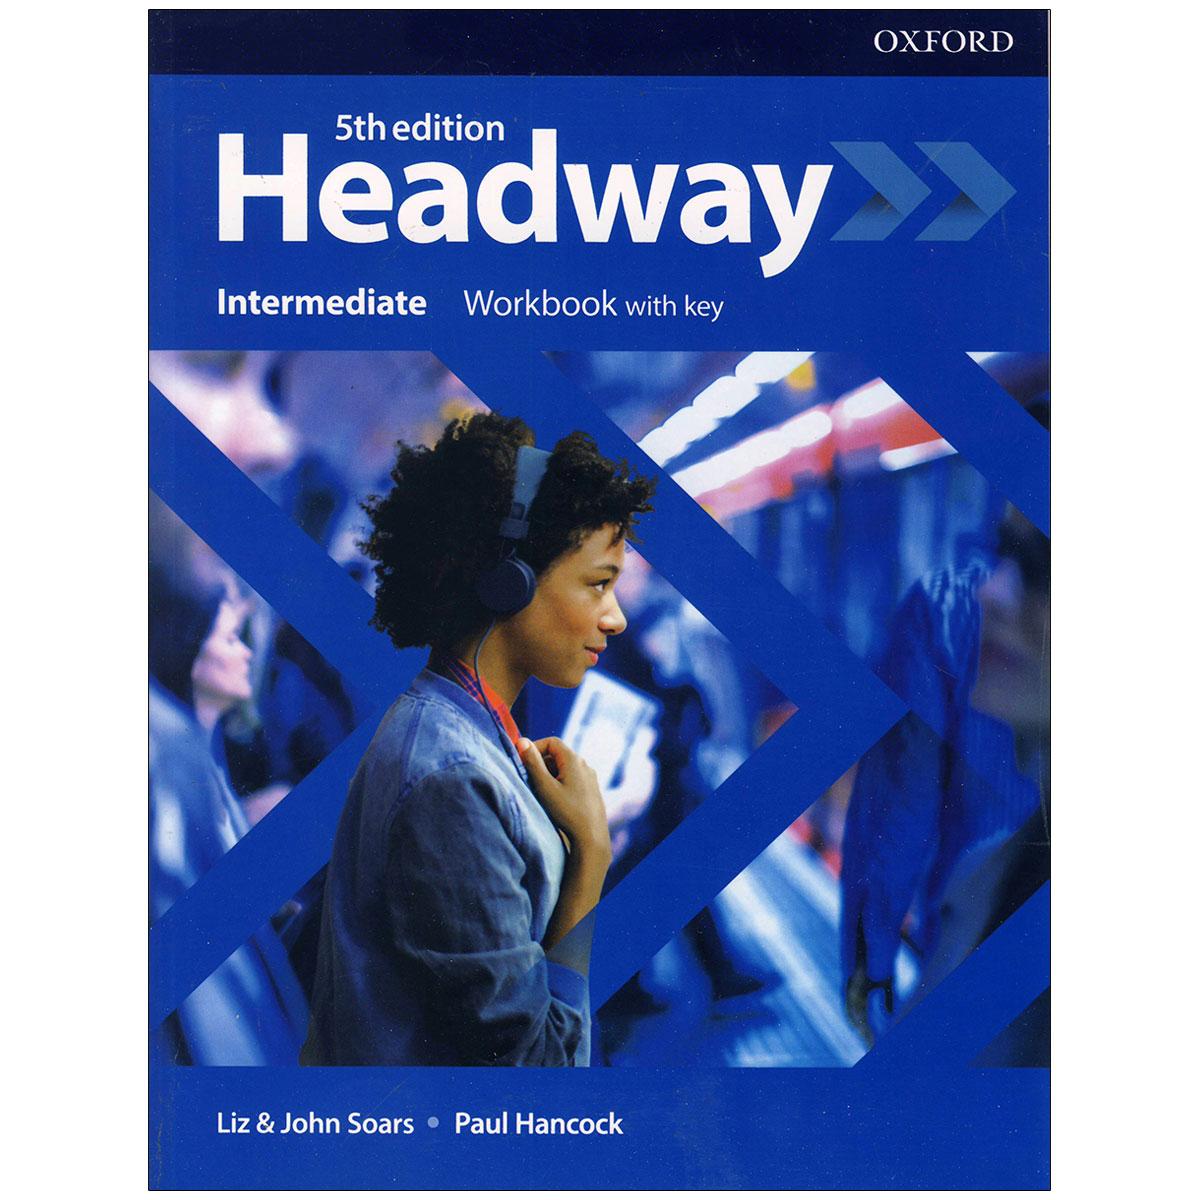 کتاب  headway intermediate 5th edition اثر john and liz soars and Paul Hancock انتشارات آکسفورد thumb 2 2